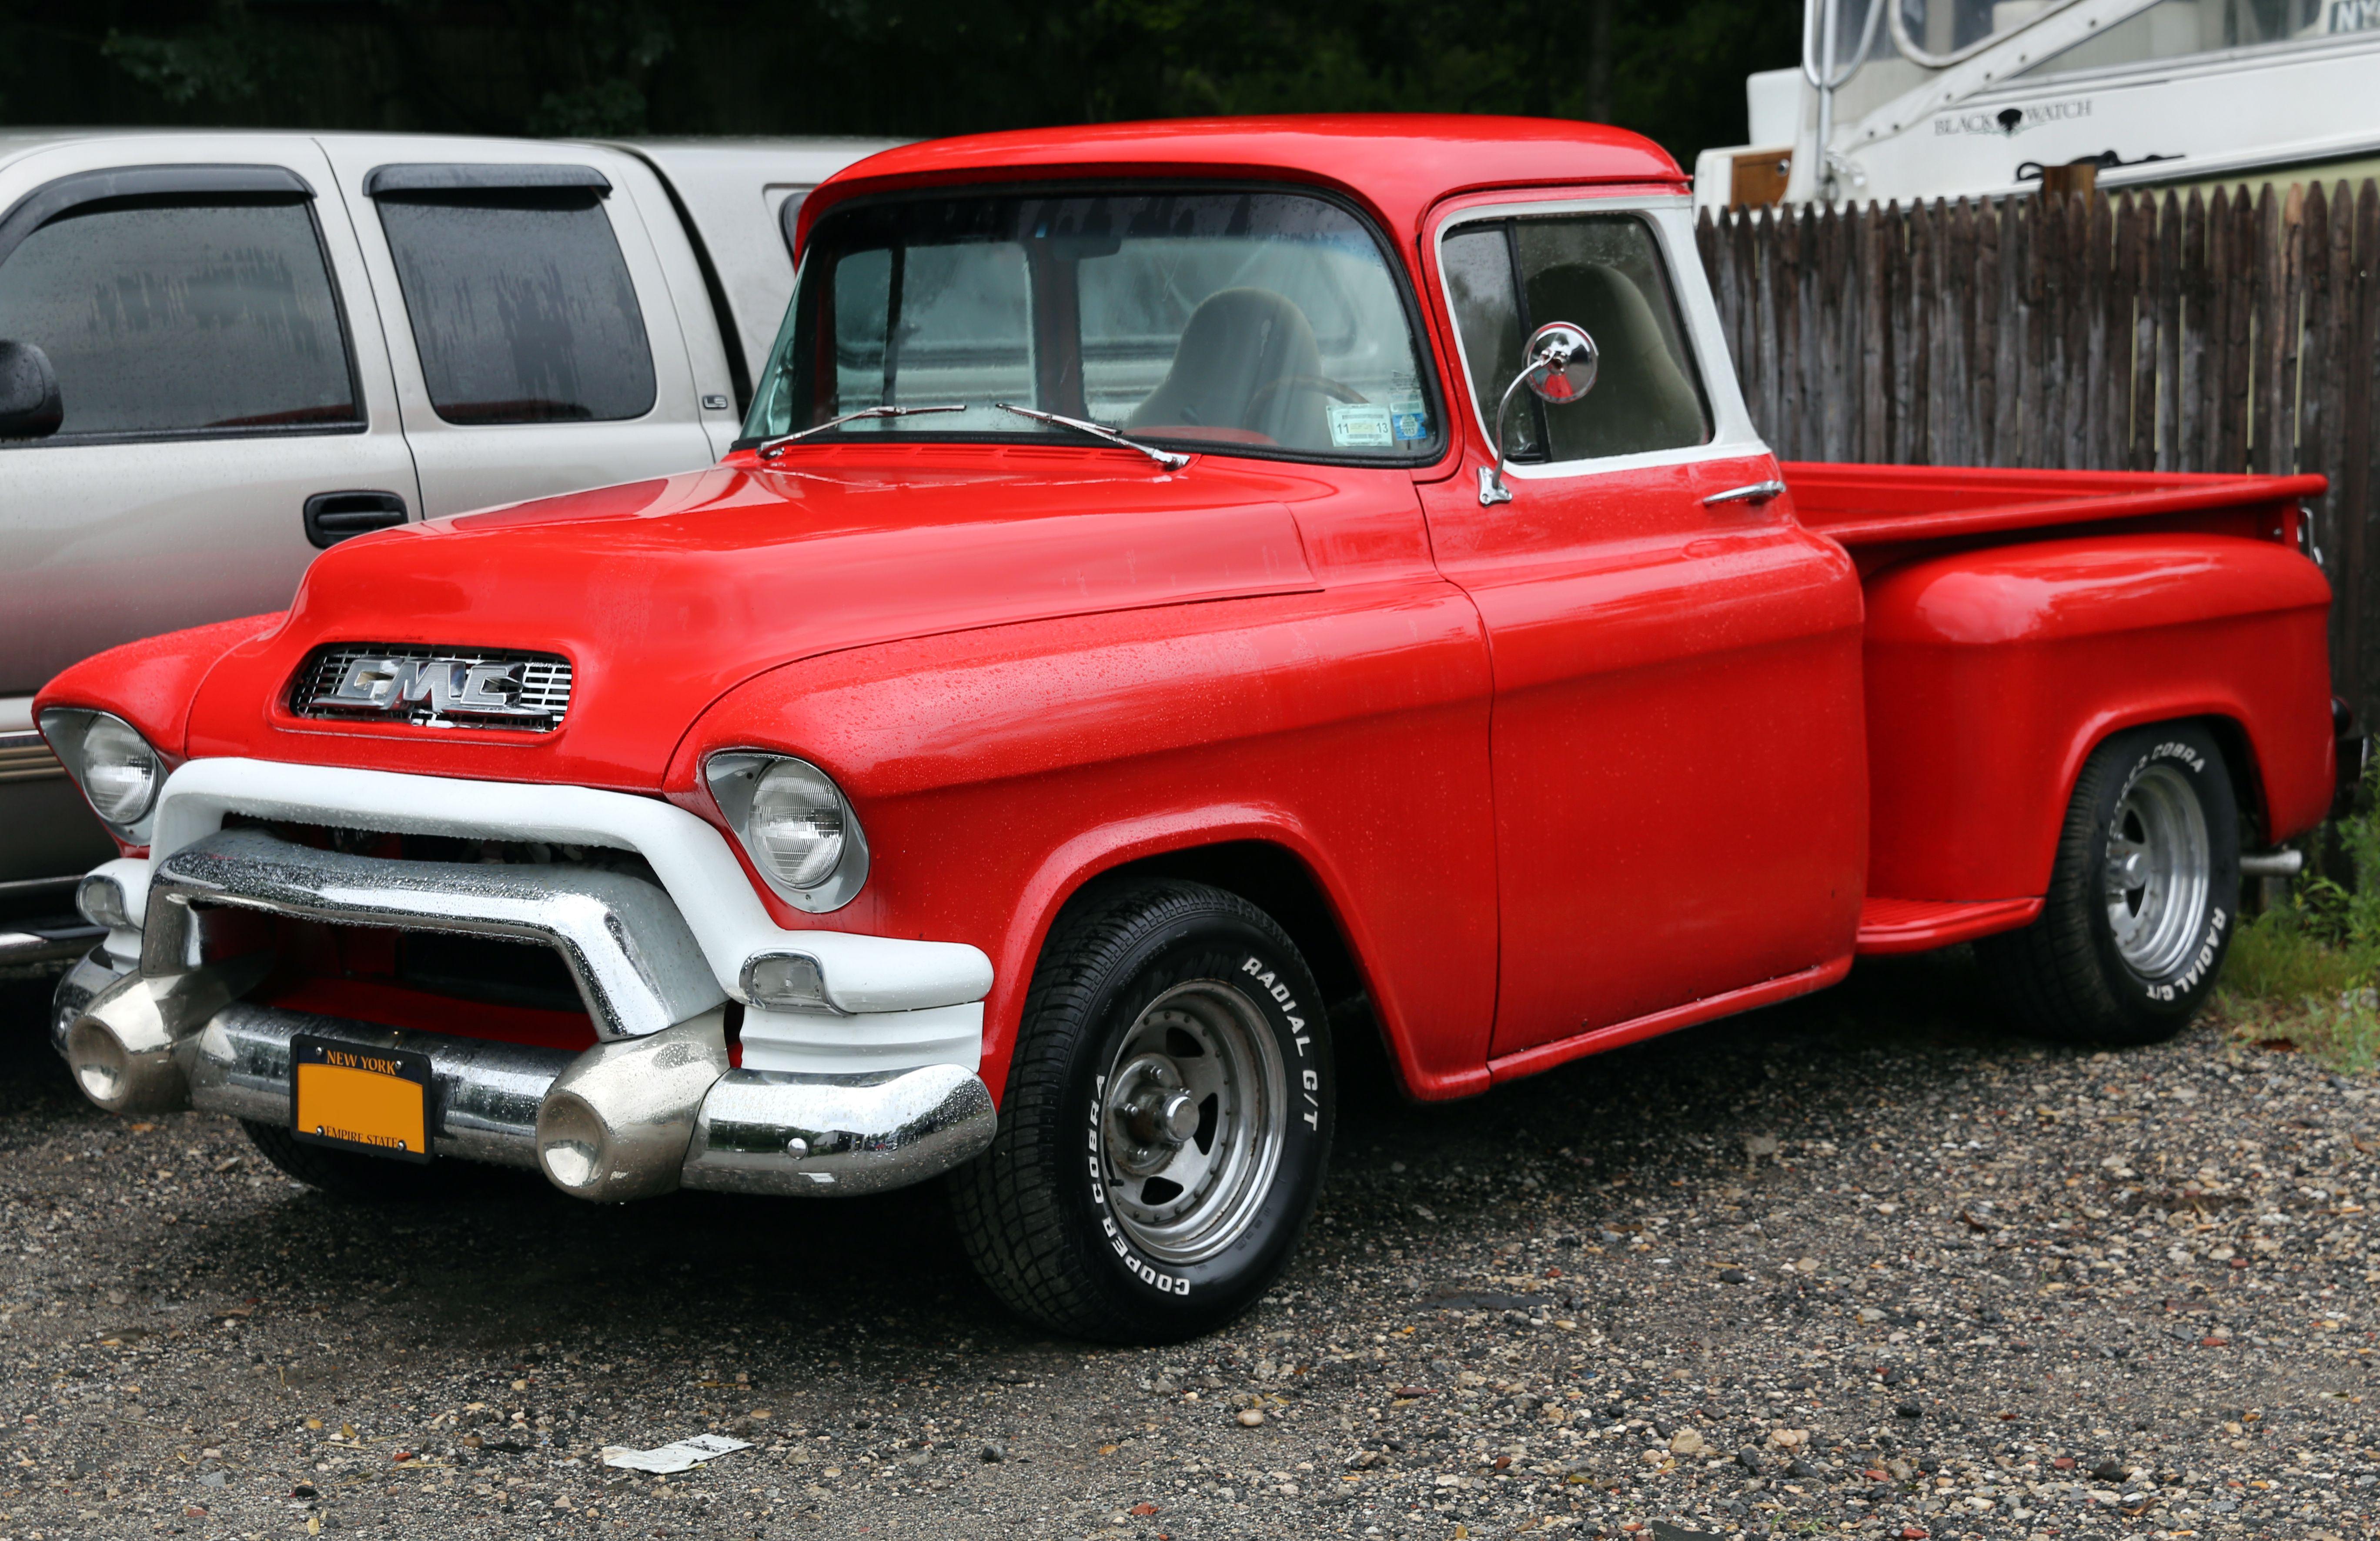 1955 Gmc Pickup Chevrolet Classic Trucks Old Classic Cars